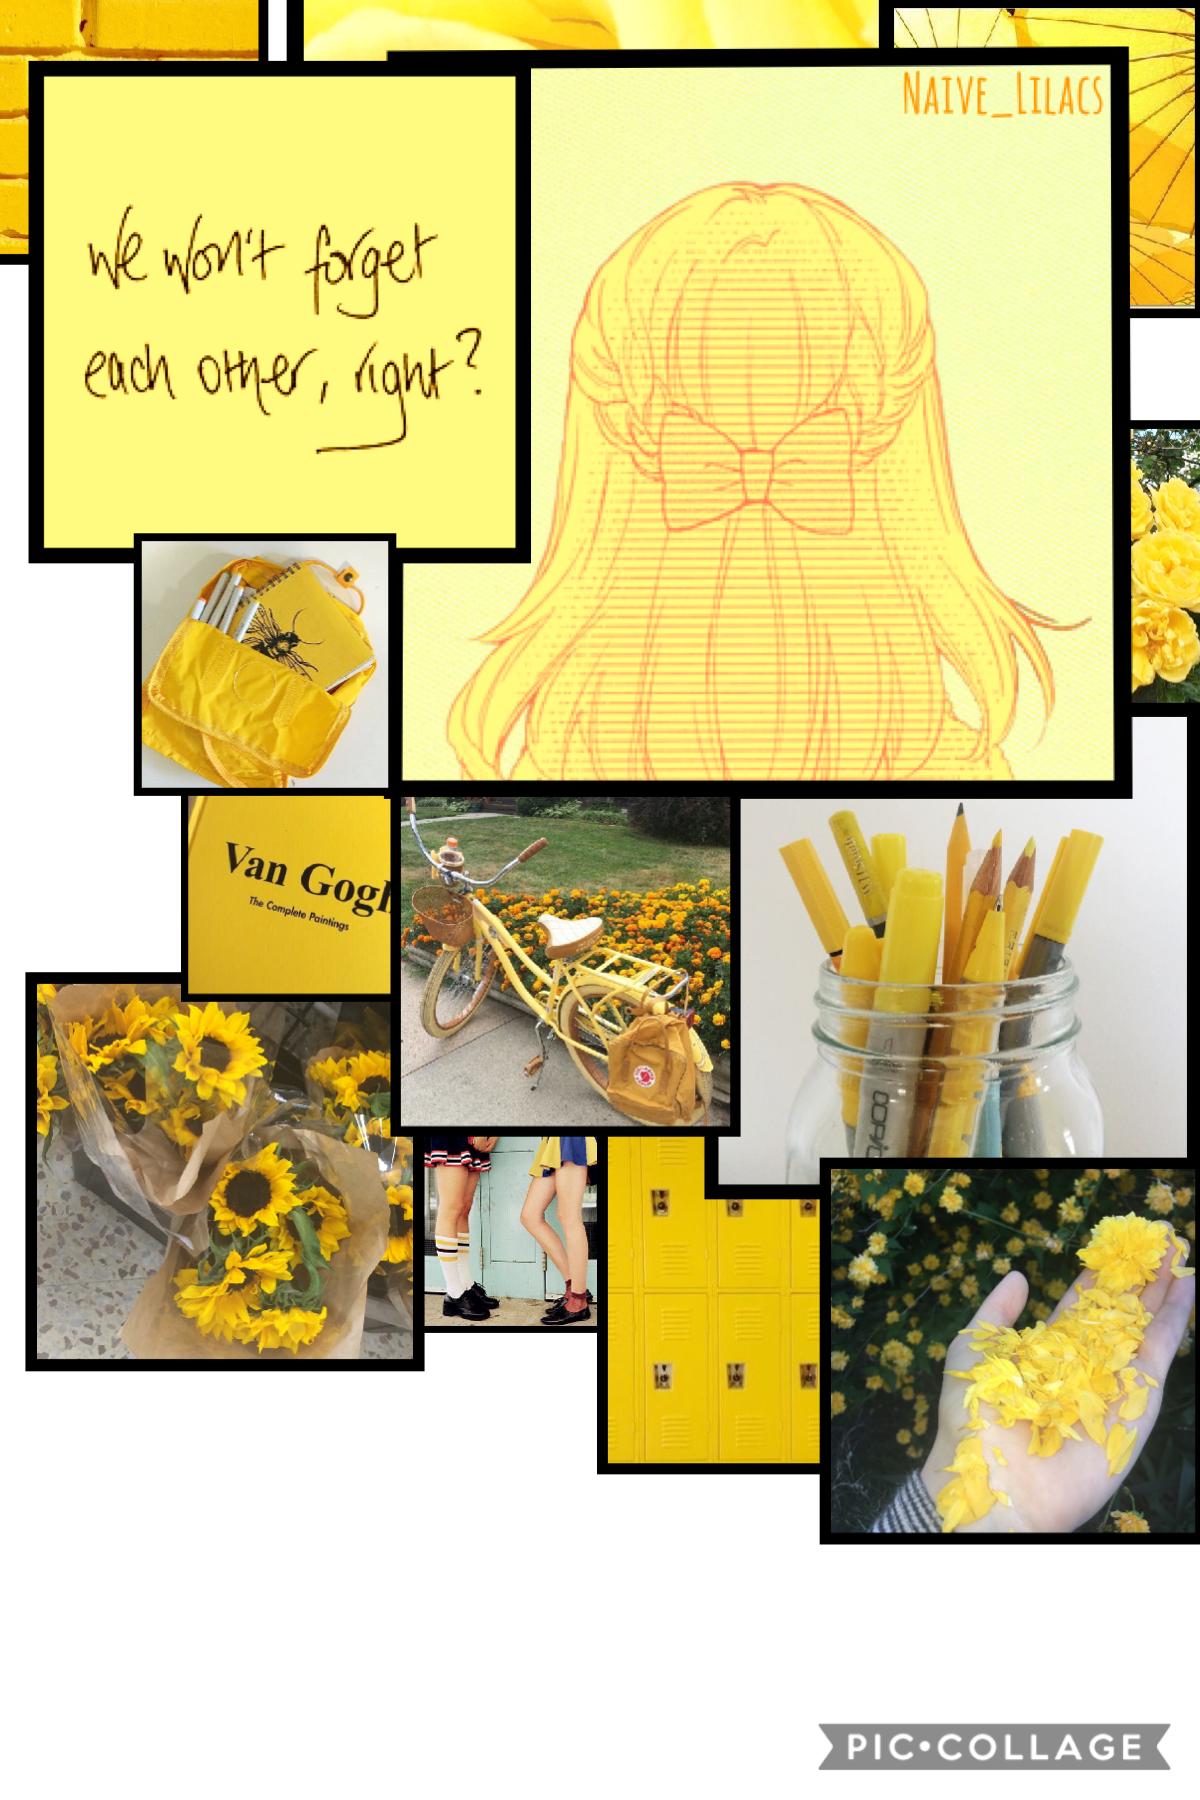 Yellowww💛what's your favorite yellow emoji?🌼 🐱🐥🌻🌕🌙⭐️🍋🛵📒